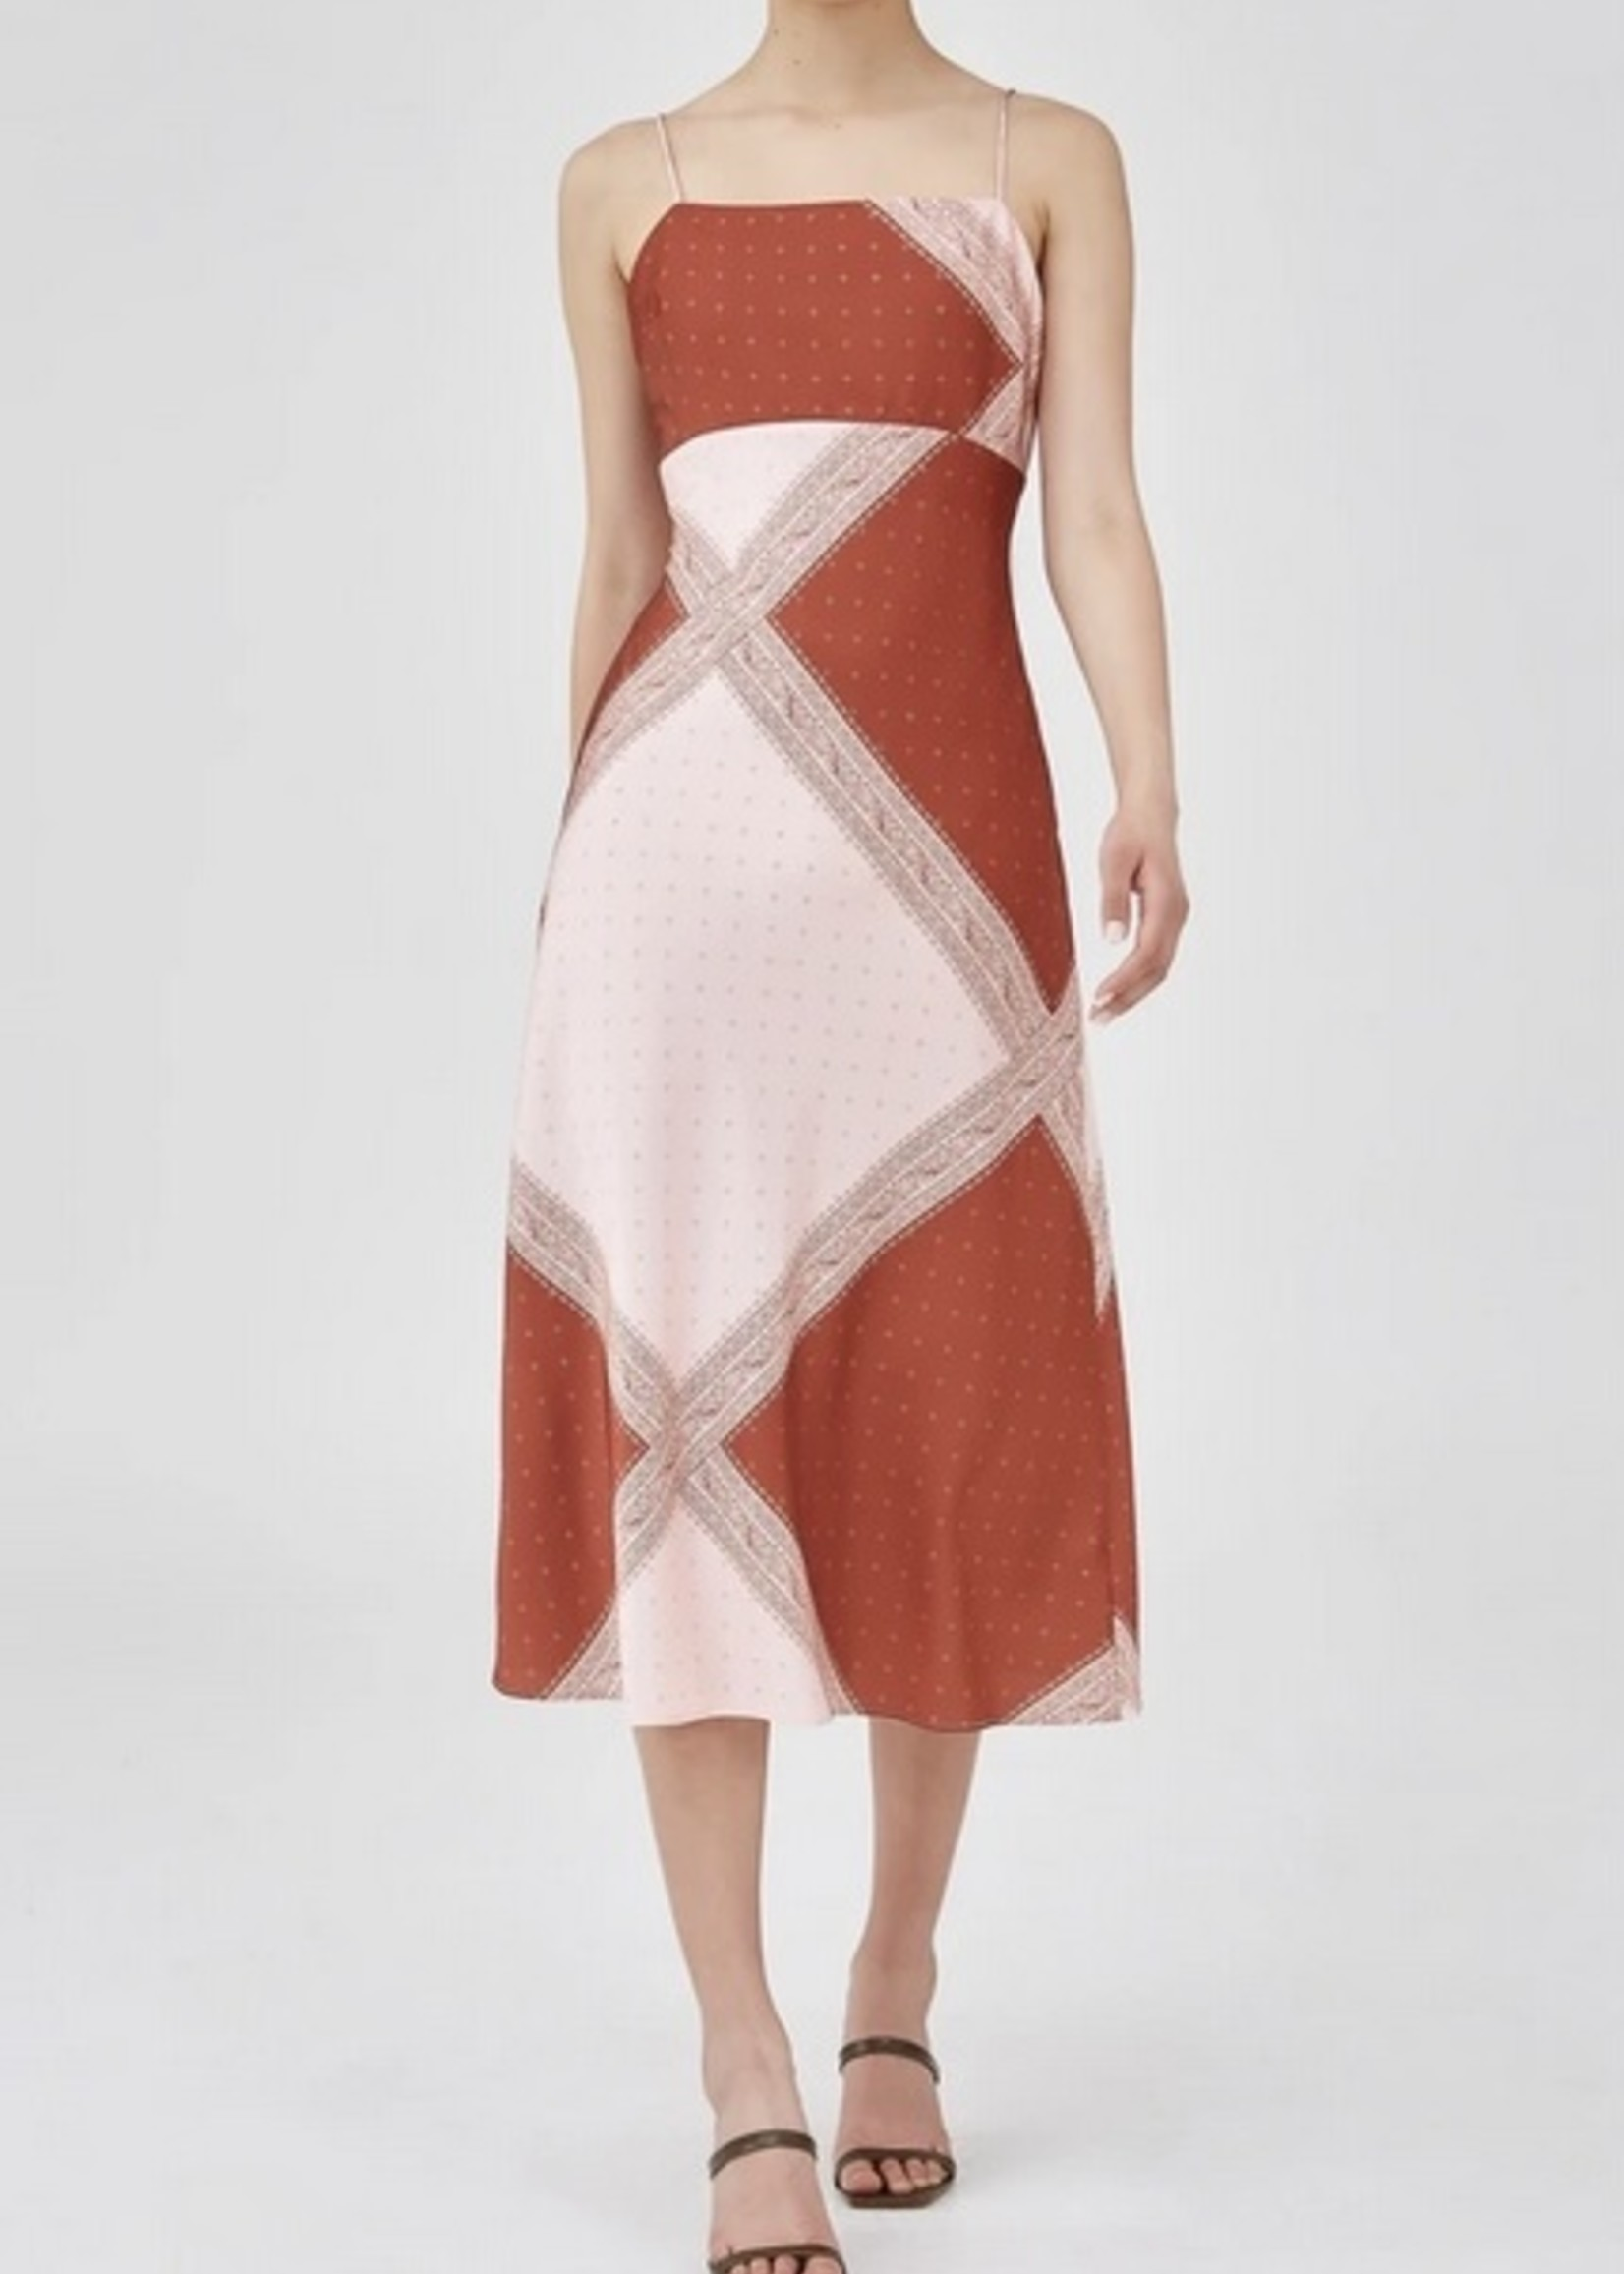 Elitaire Boutique Maya Midi Dress